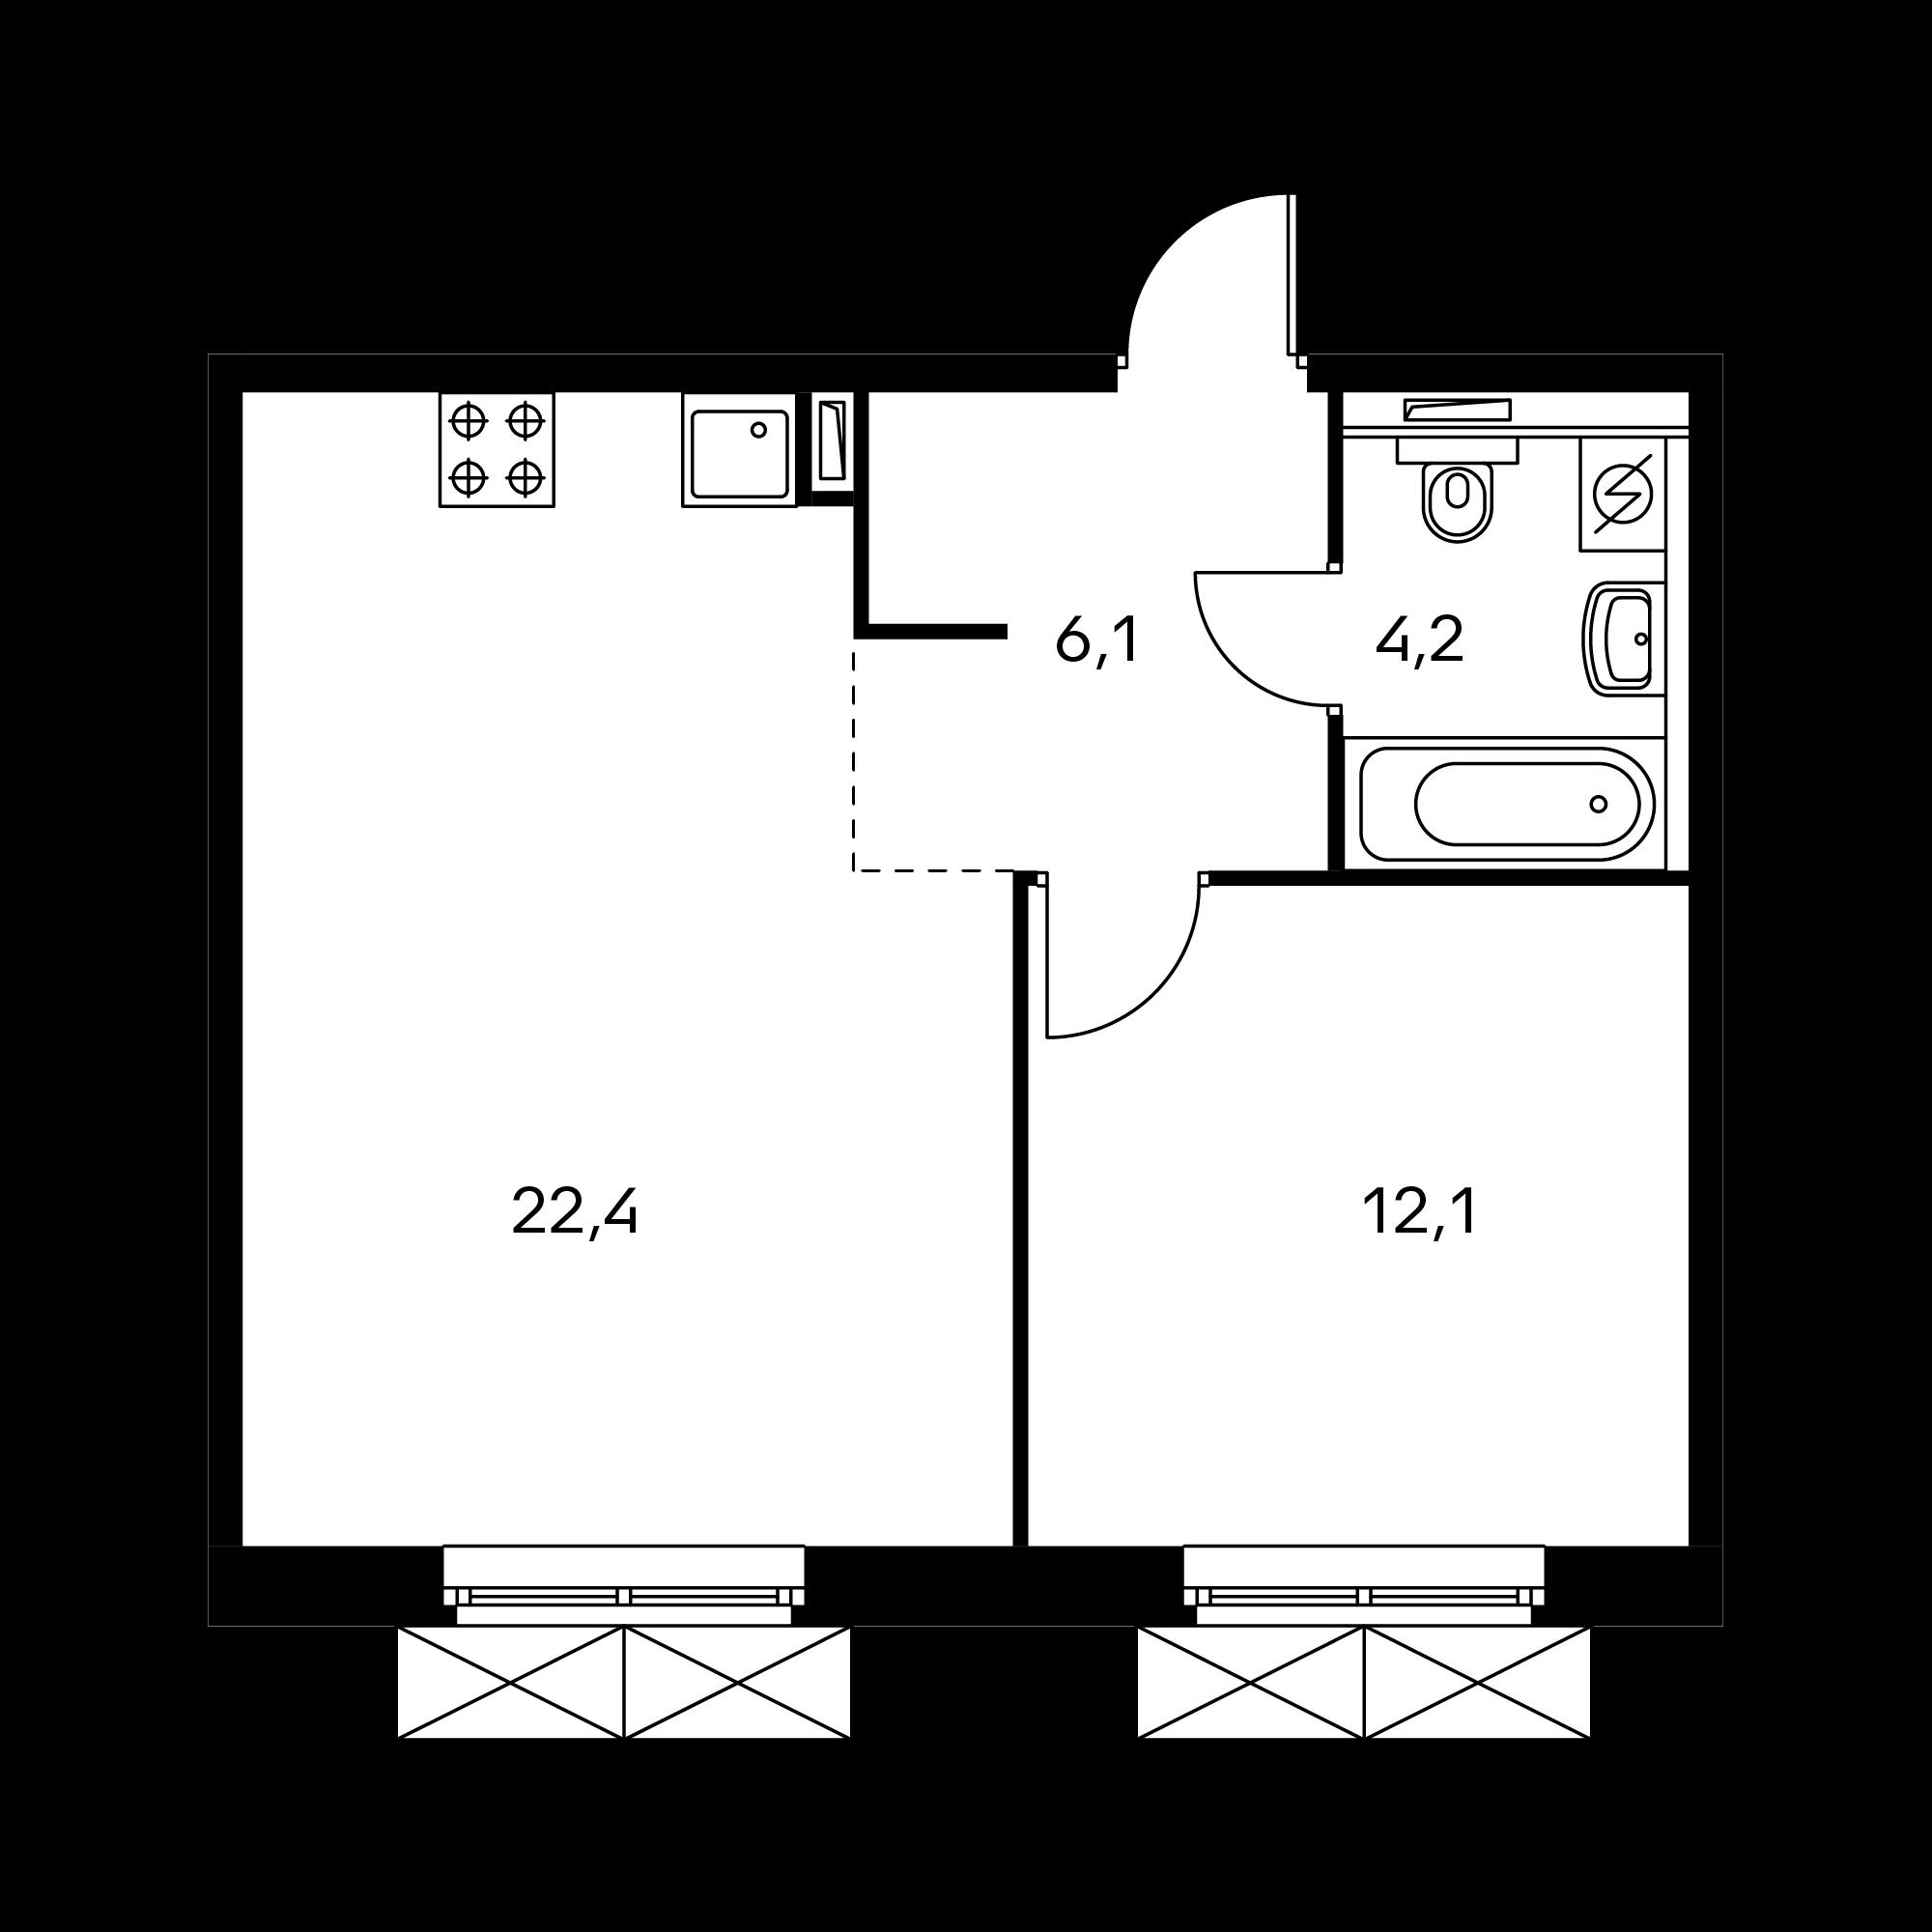 1EL5_7.8-2